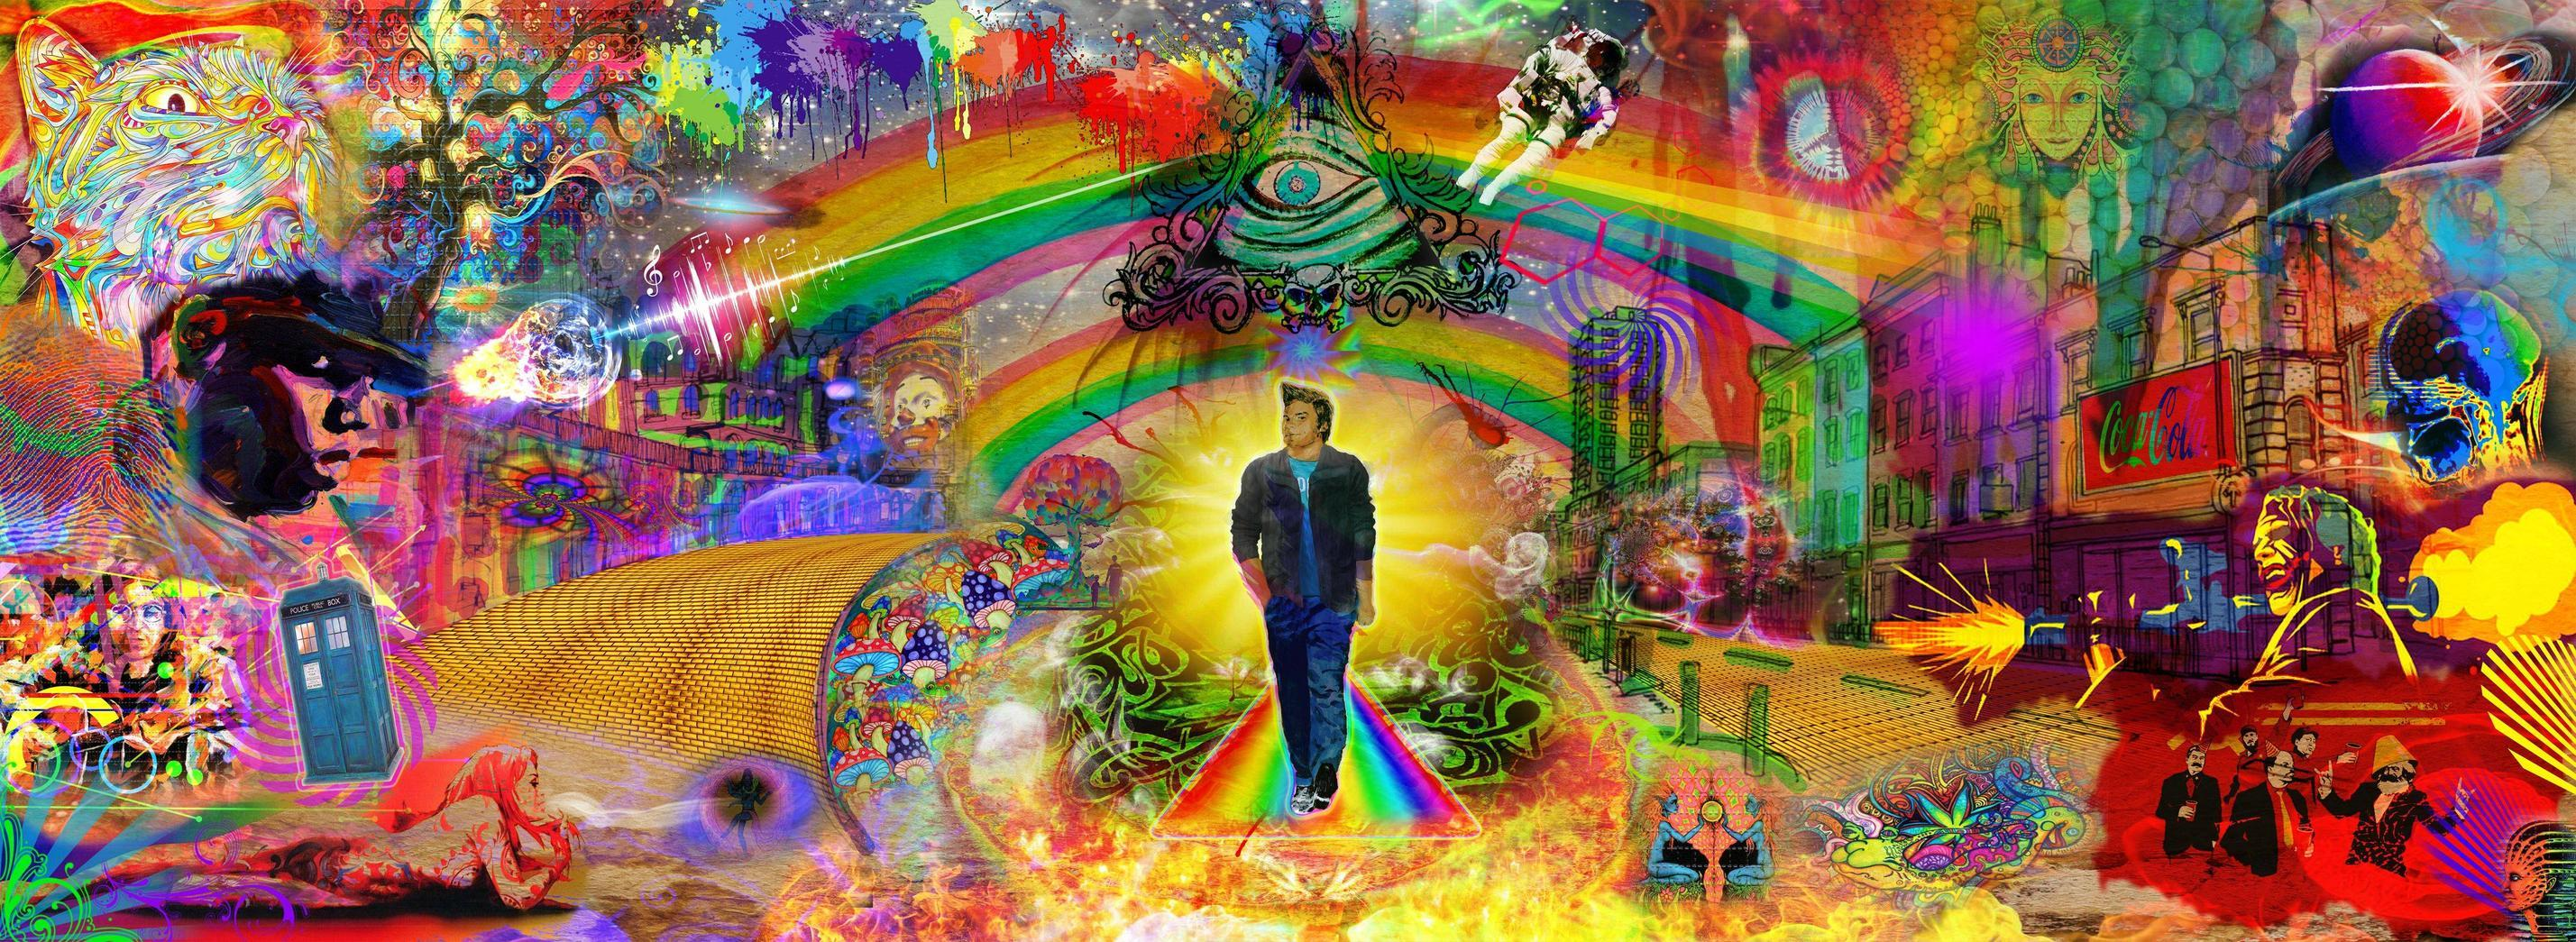 Acid Trip Wallpapers Group 65